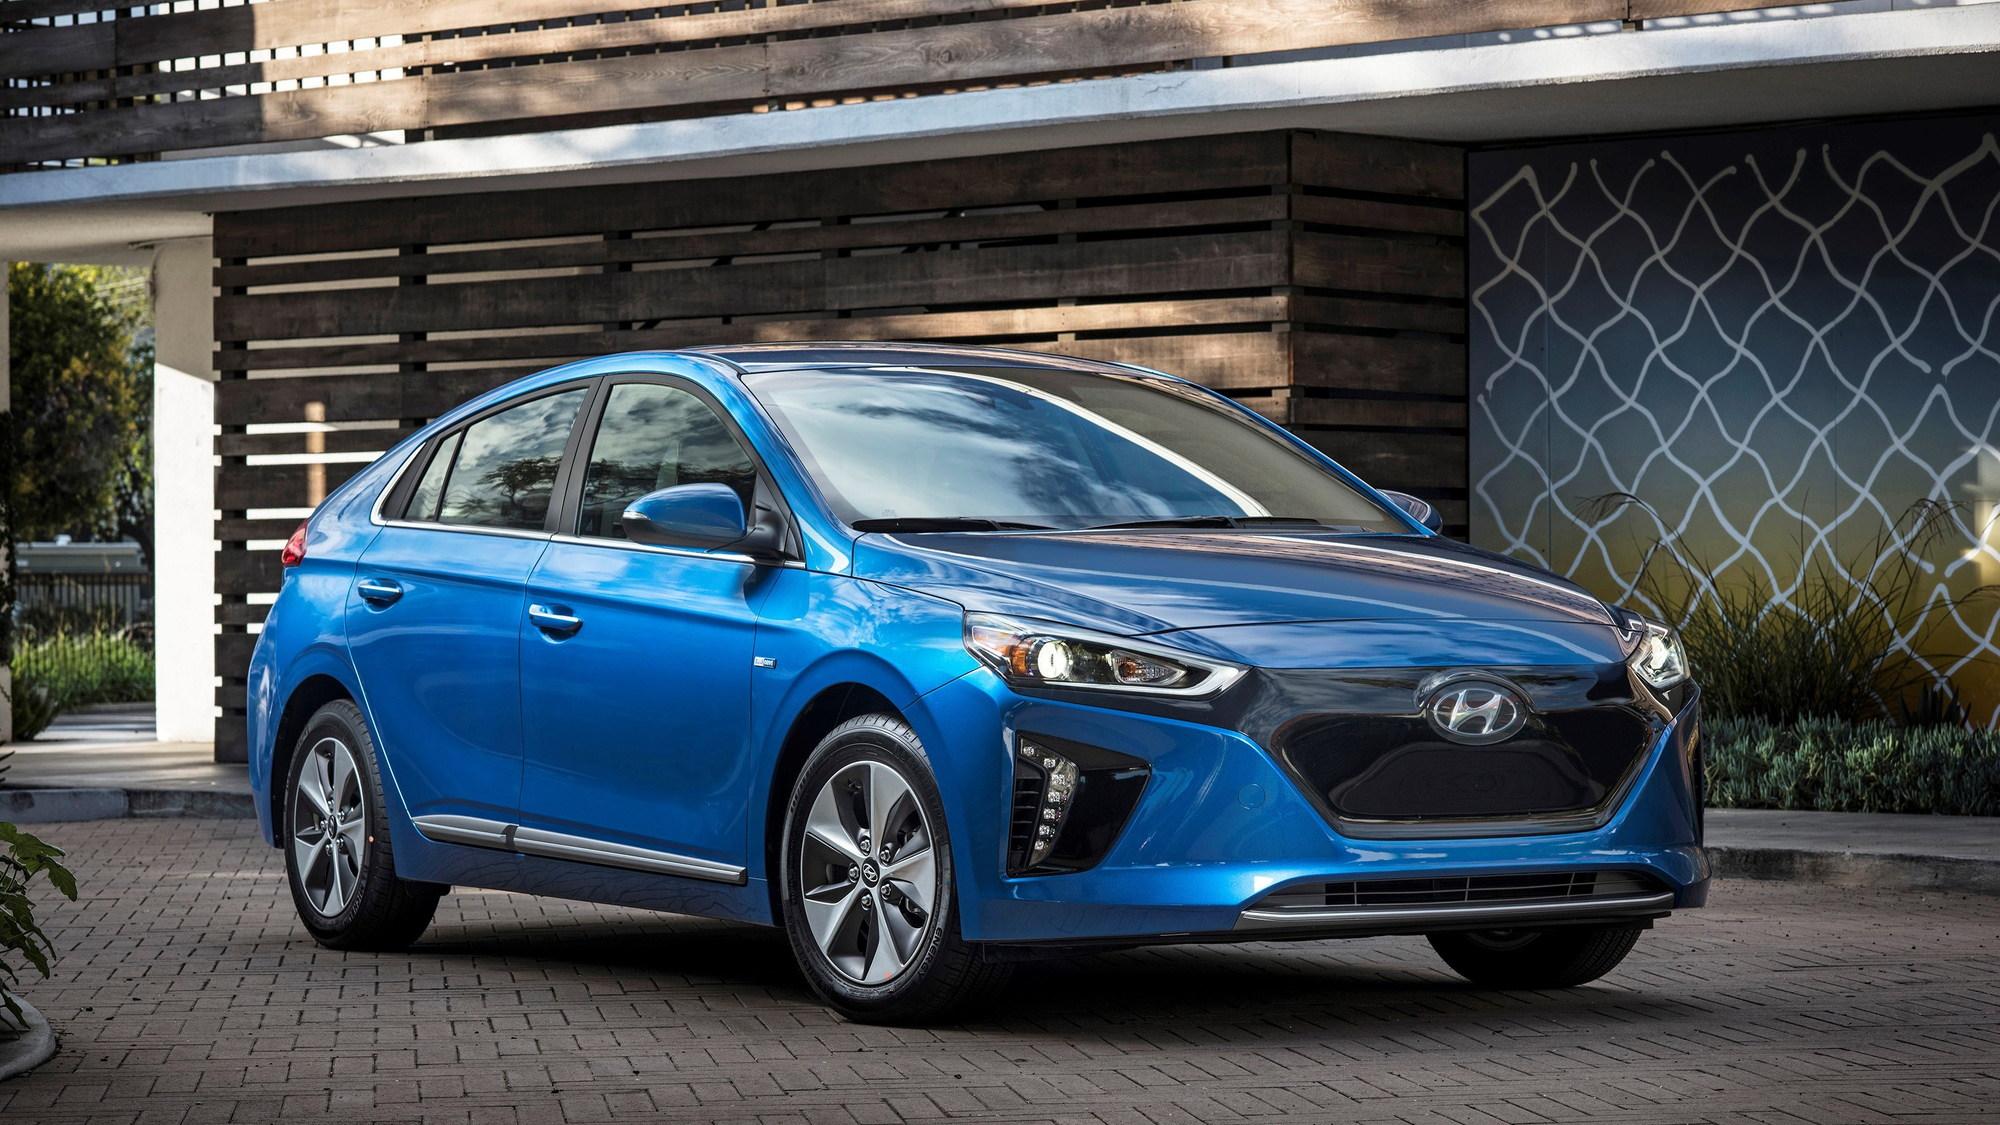 2019 Hyundai Ioniq Electric